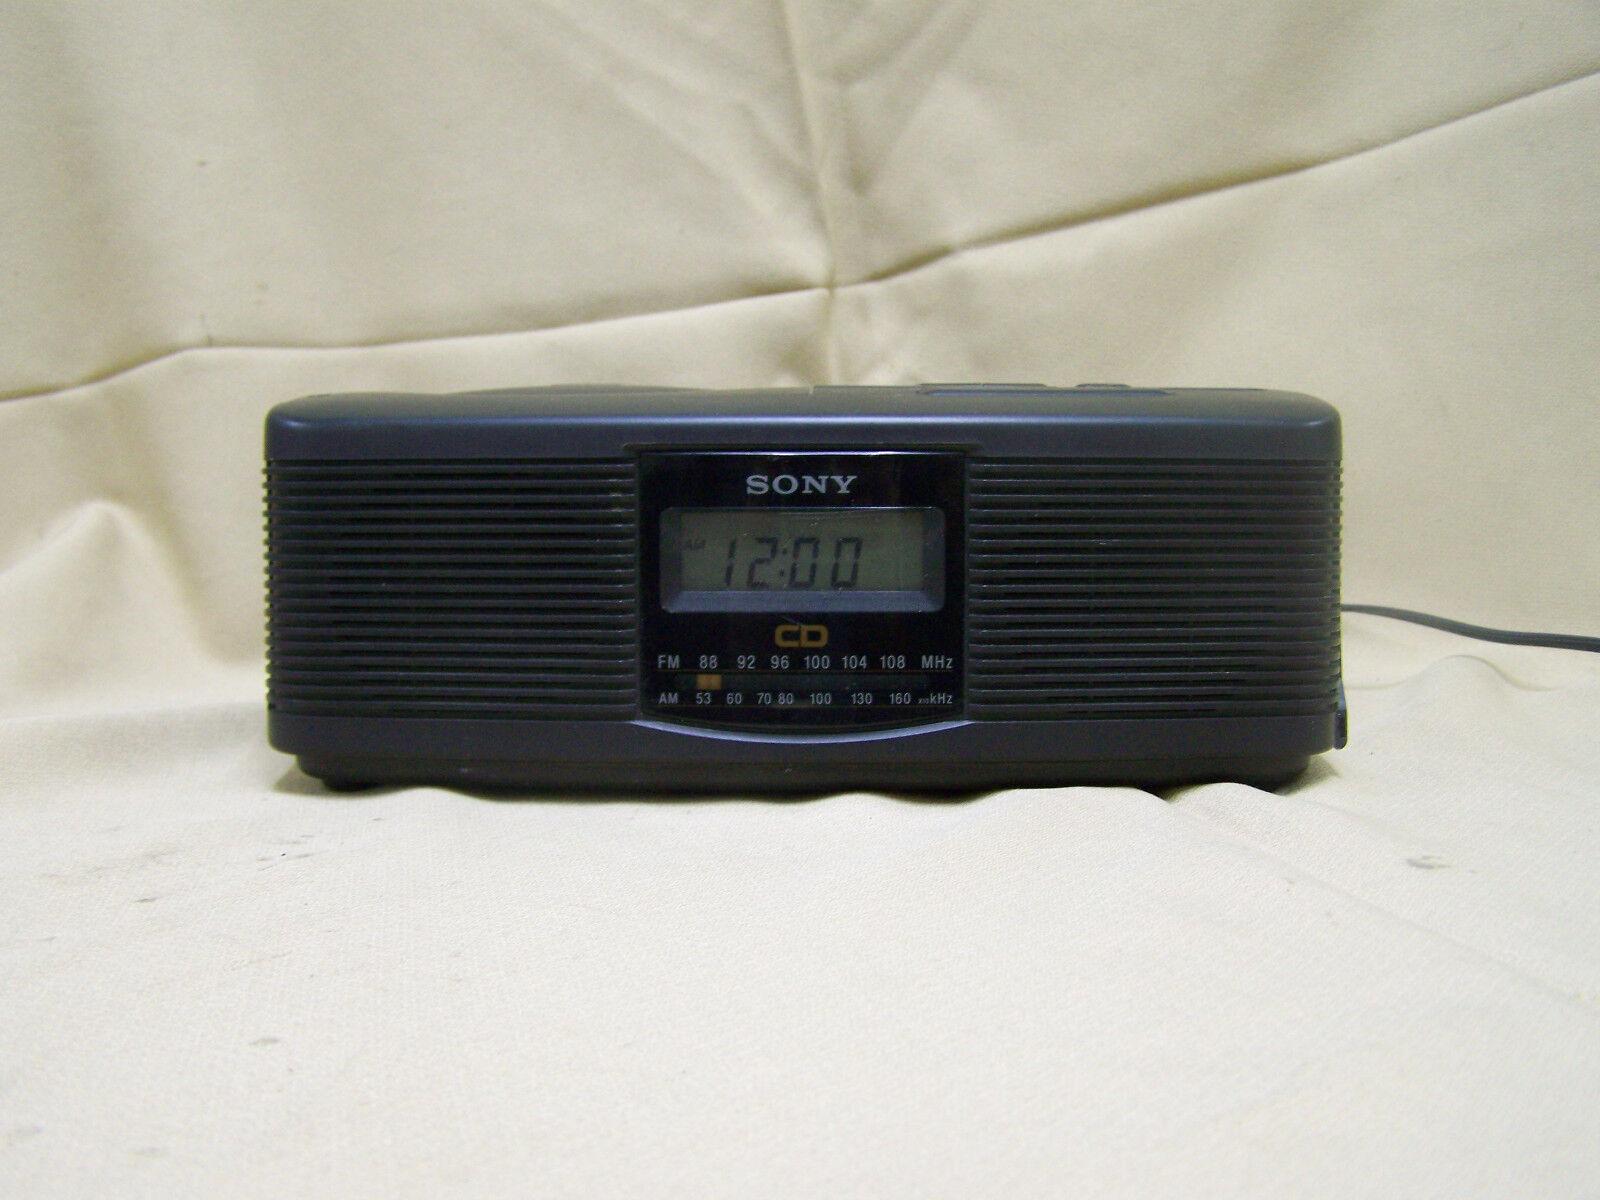 Sony ICF-CD810 CD Player AM FM Radio Alarm Clock Tuner Receiver CD-R